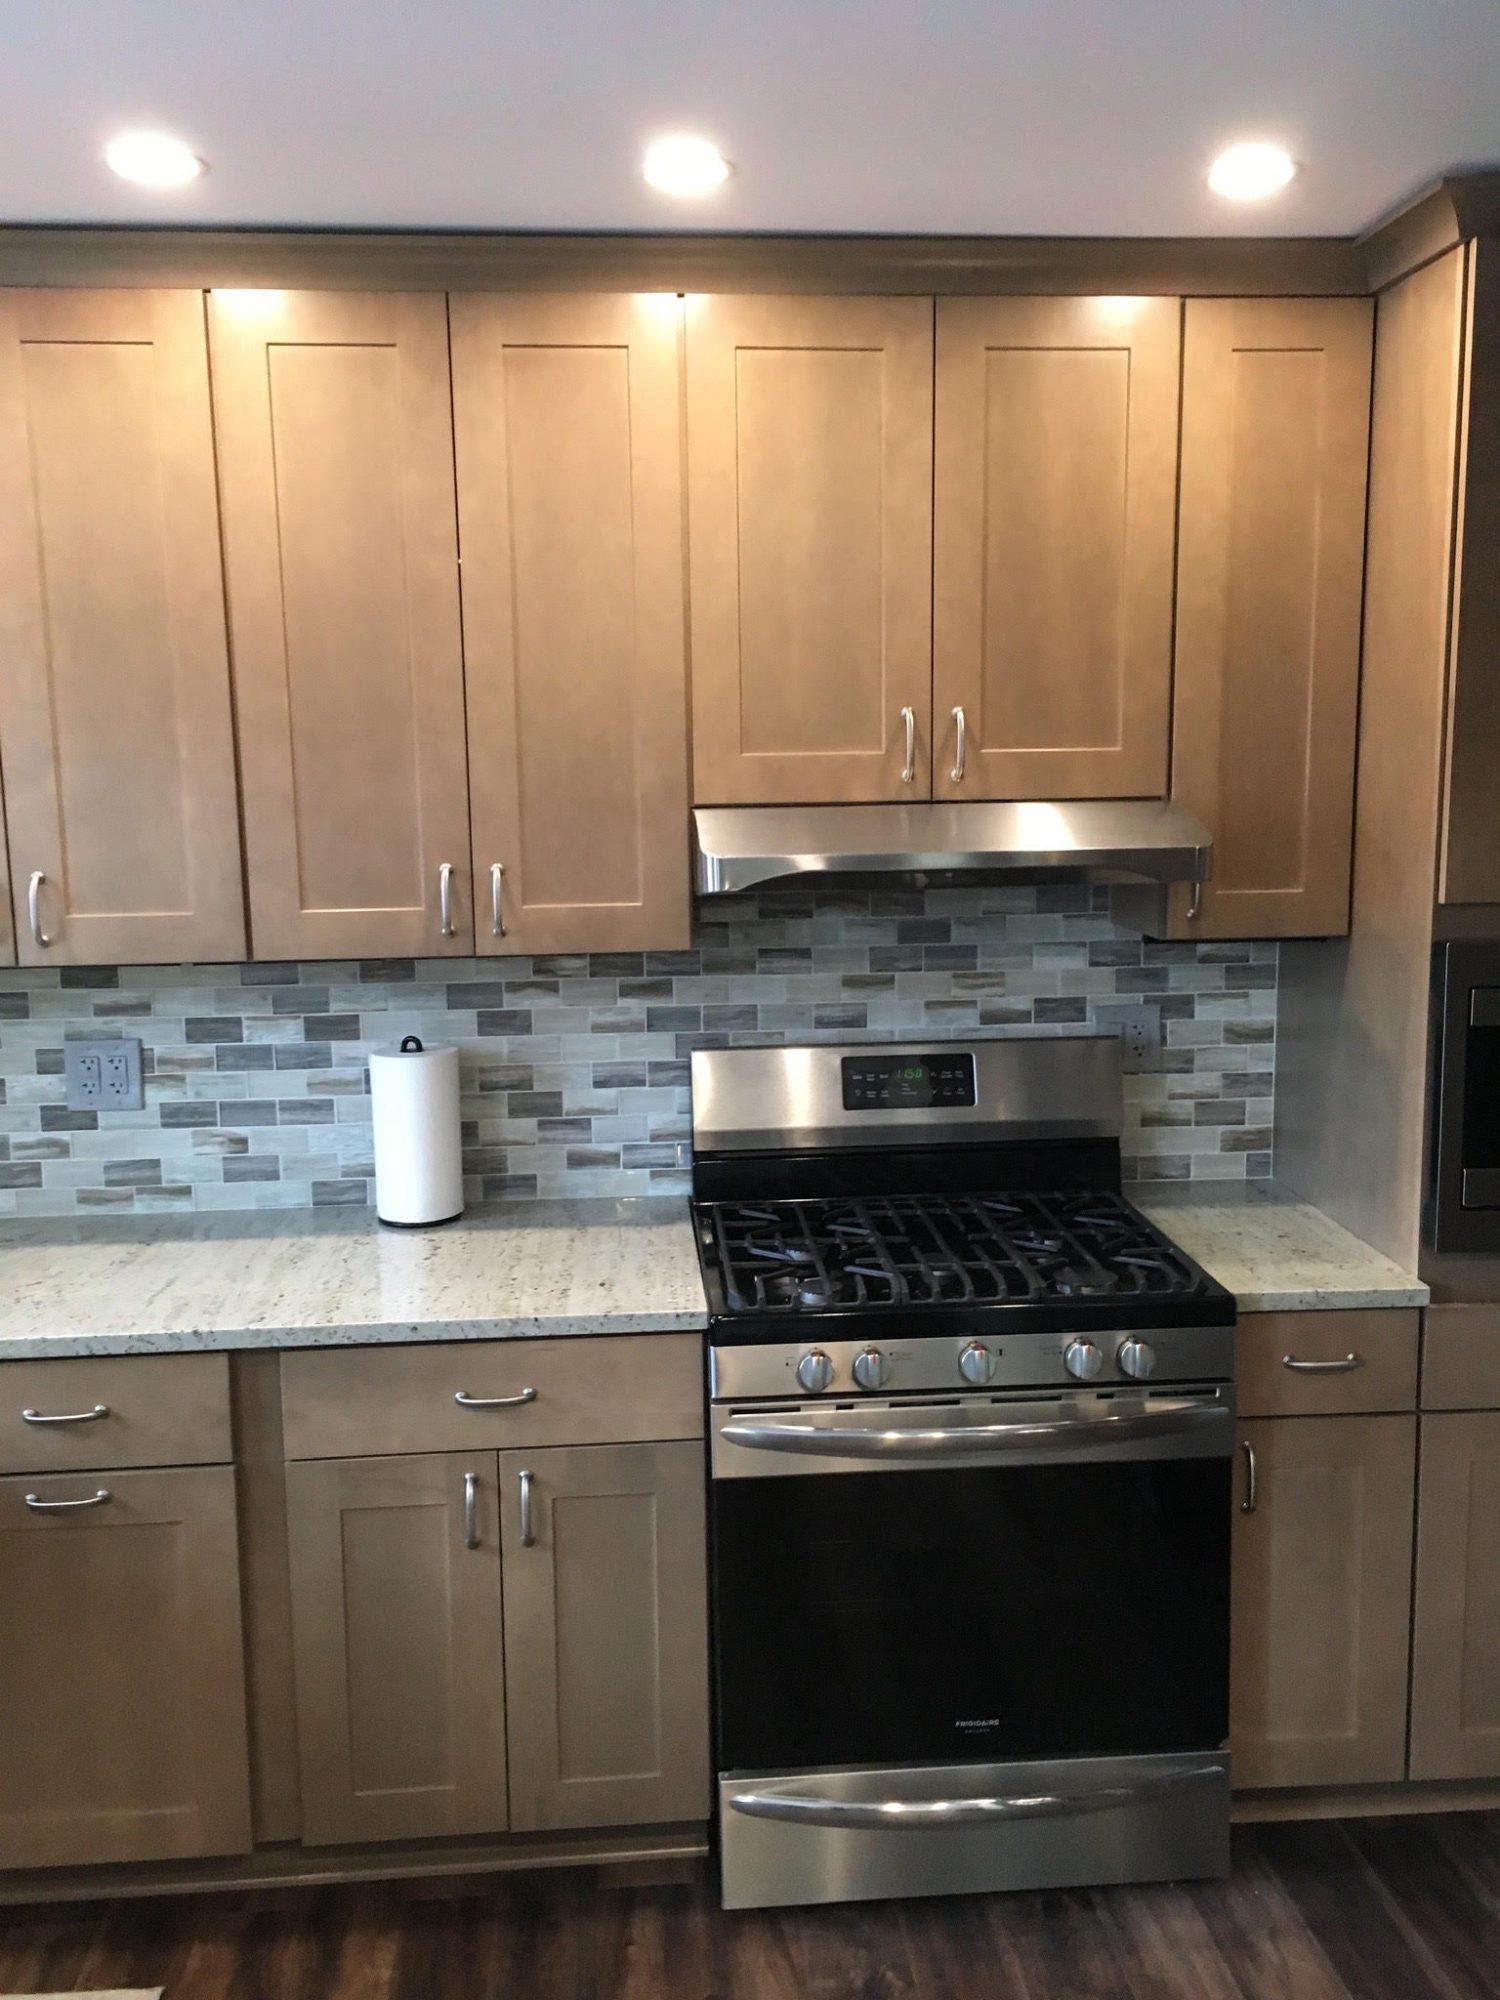 Kitchen Remodeling | Tinley Park, IL | Best Deal Inc.